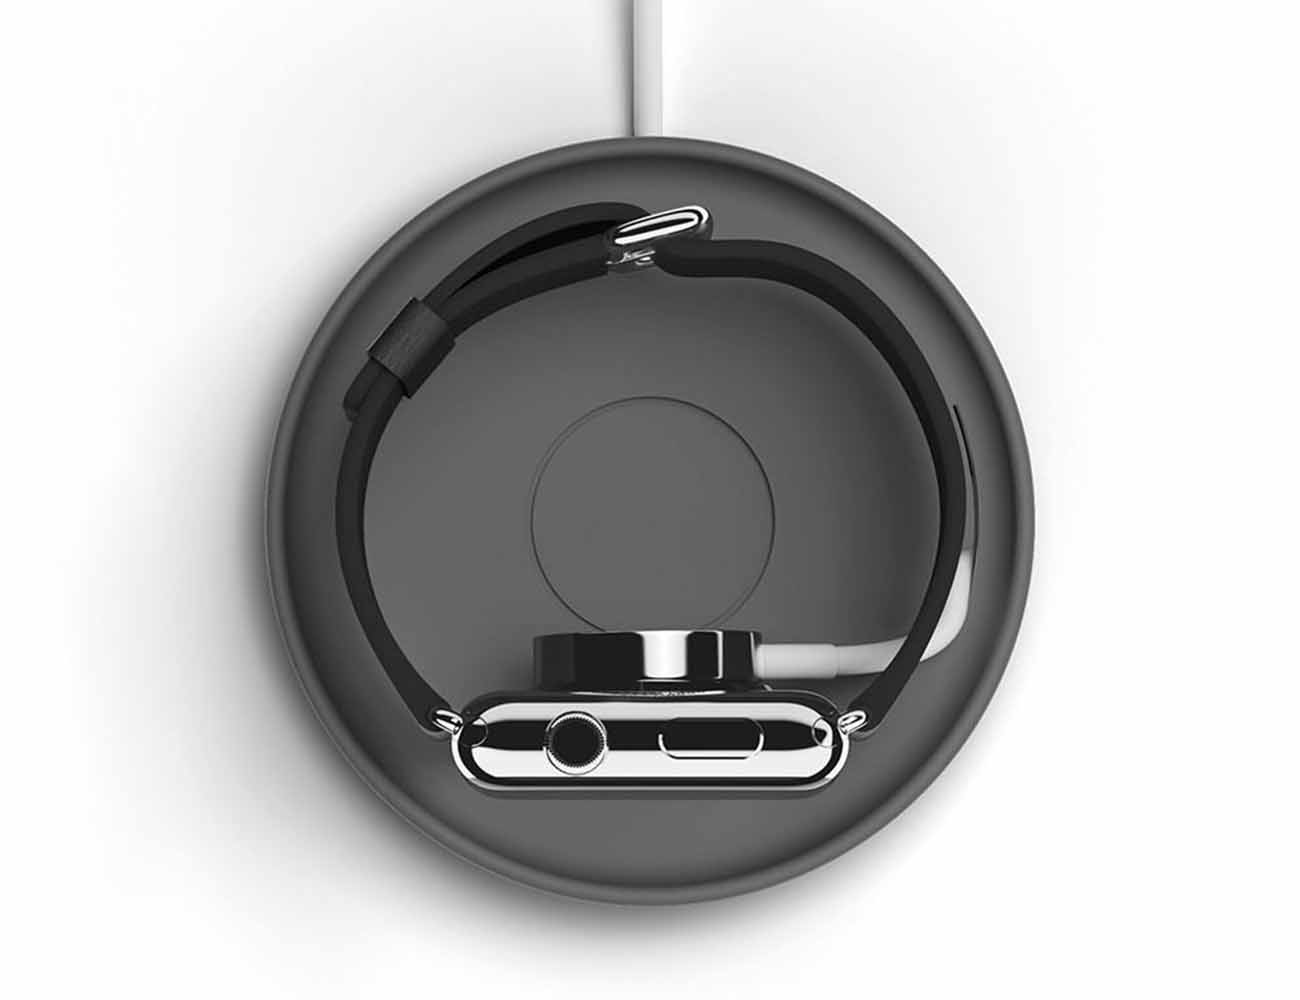 Kosta – Apple Watch Coaster by Bluelounge